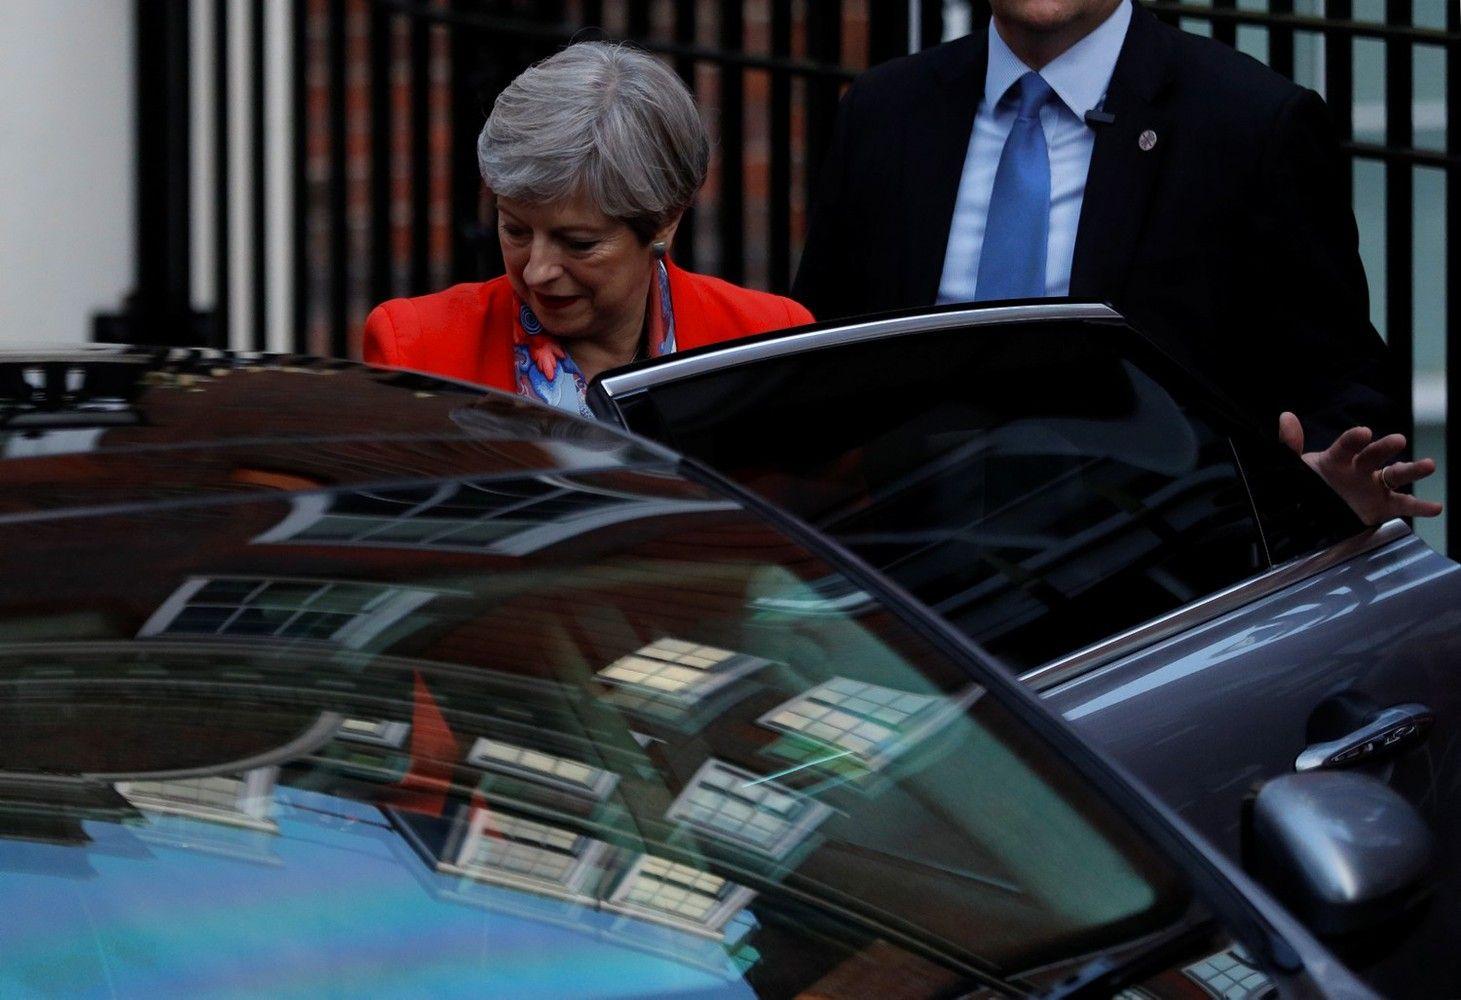 Pernakt svaras sterlingų neteko po 2%